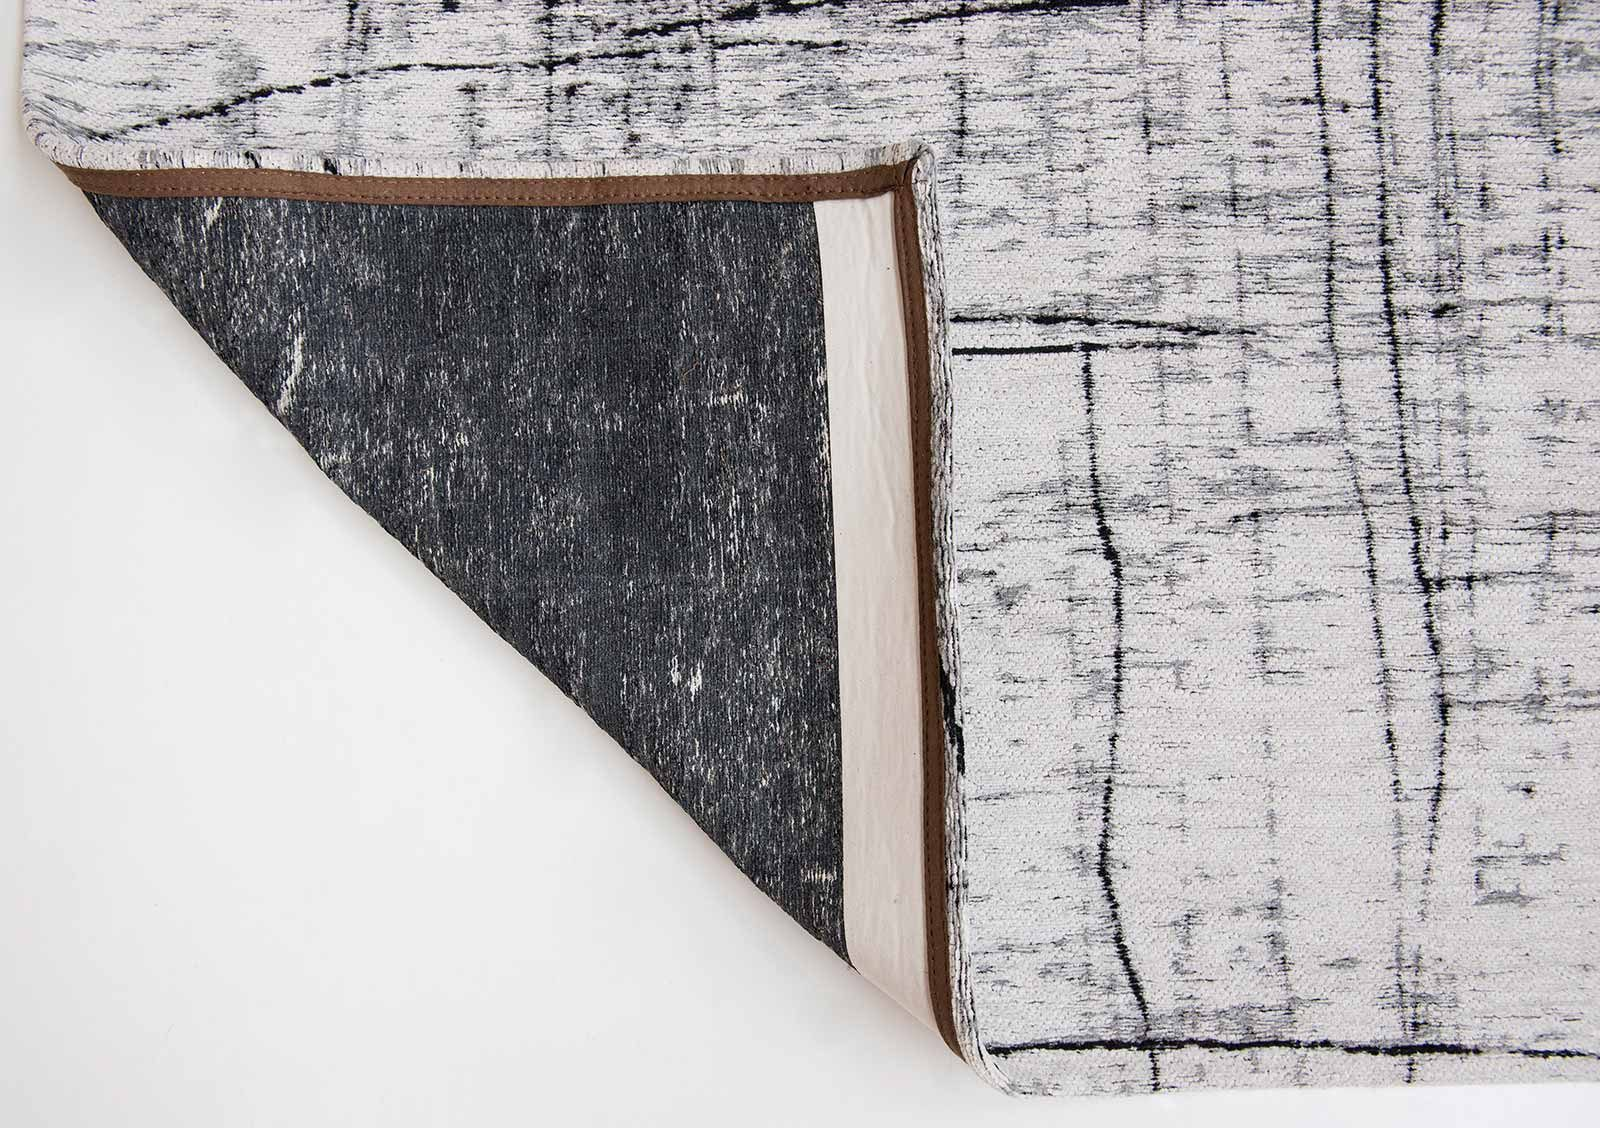 alfombras Louis De Poortere LX8926 Mad Men Griff Metro Black and White back